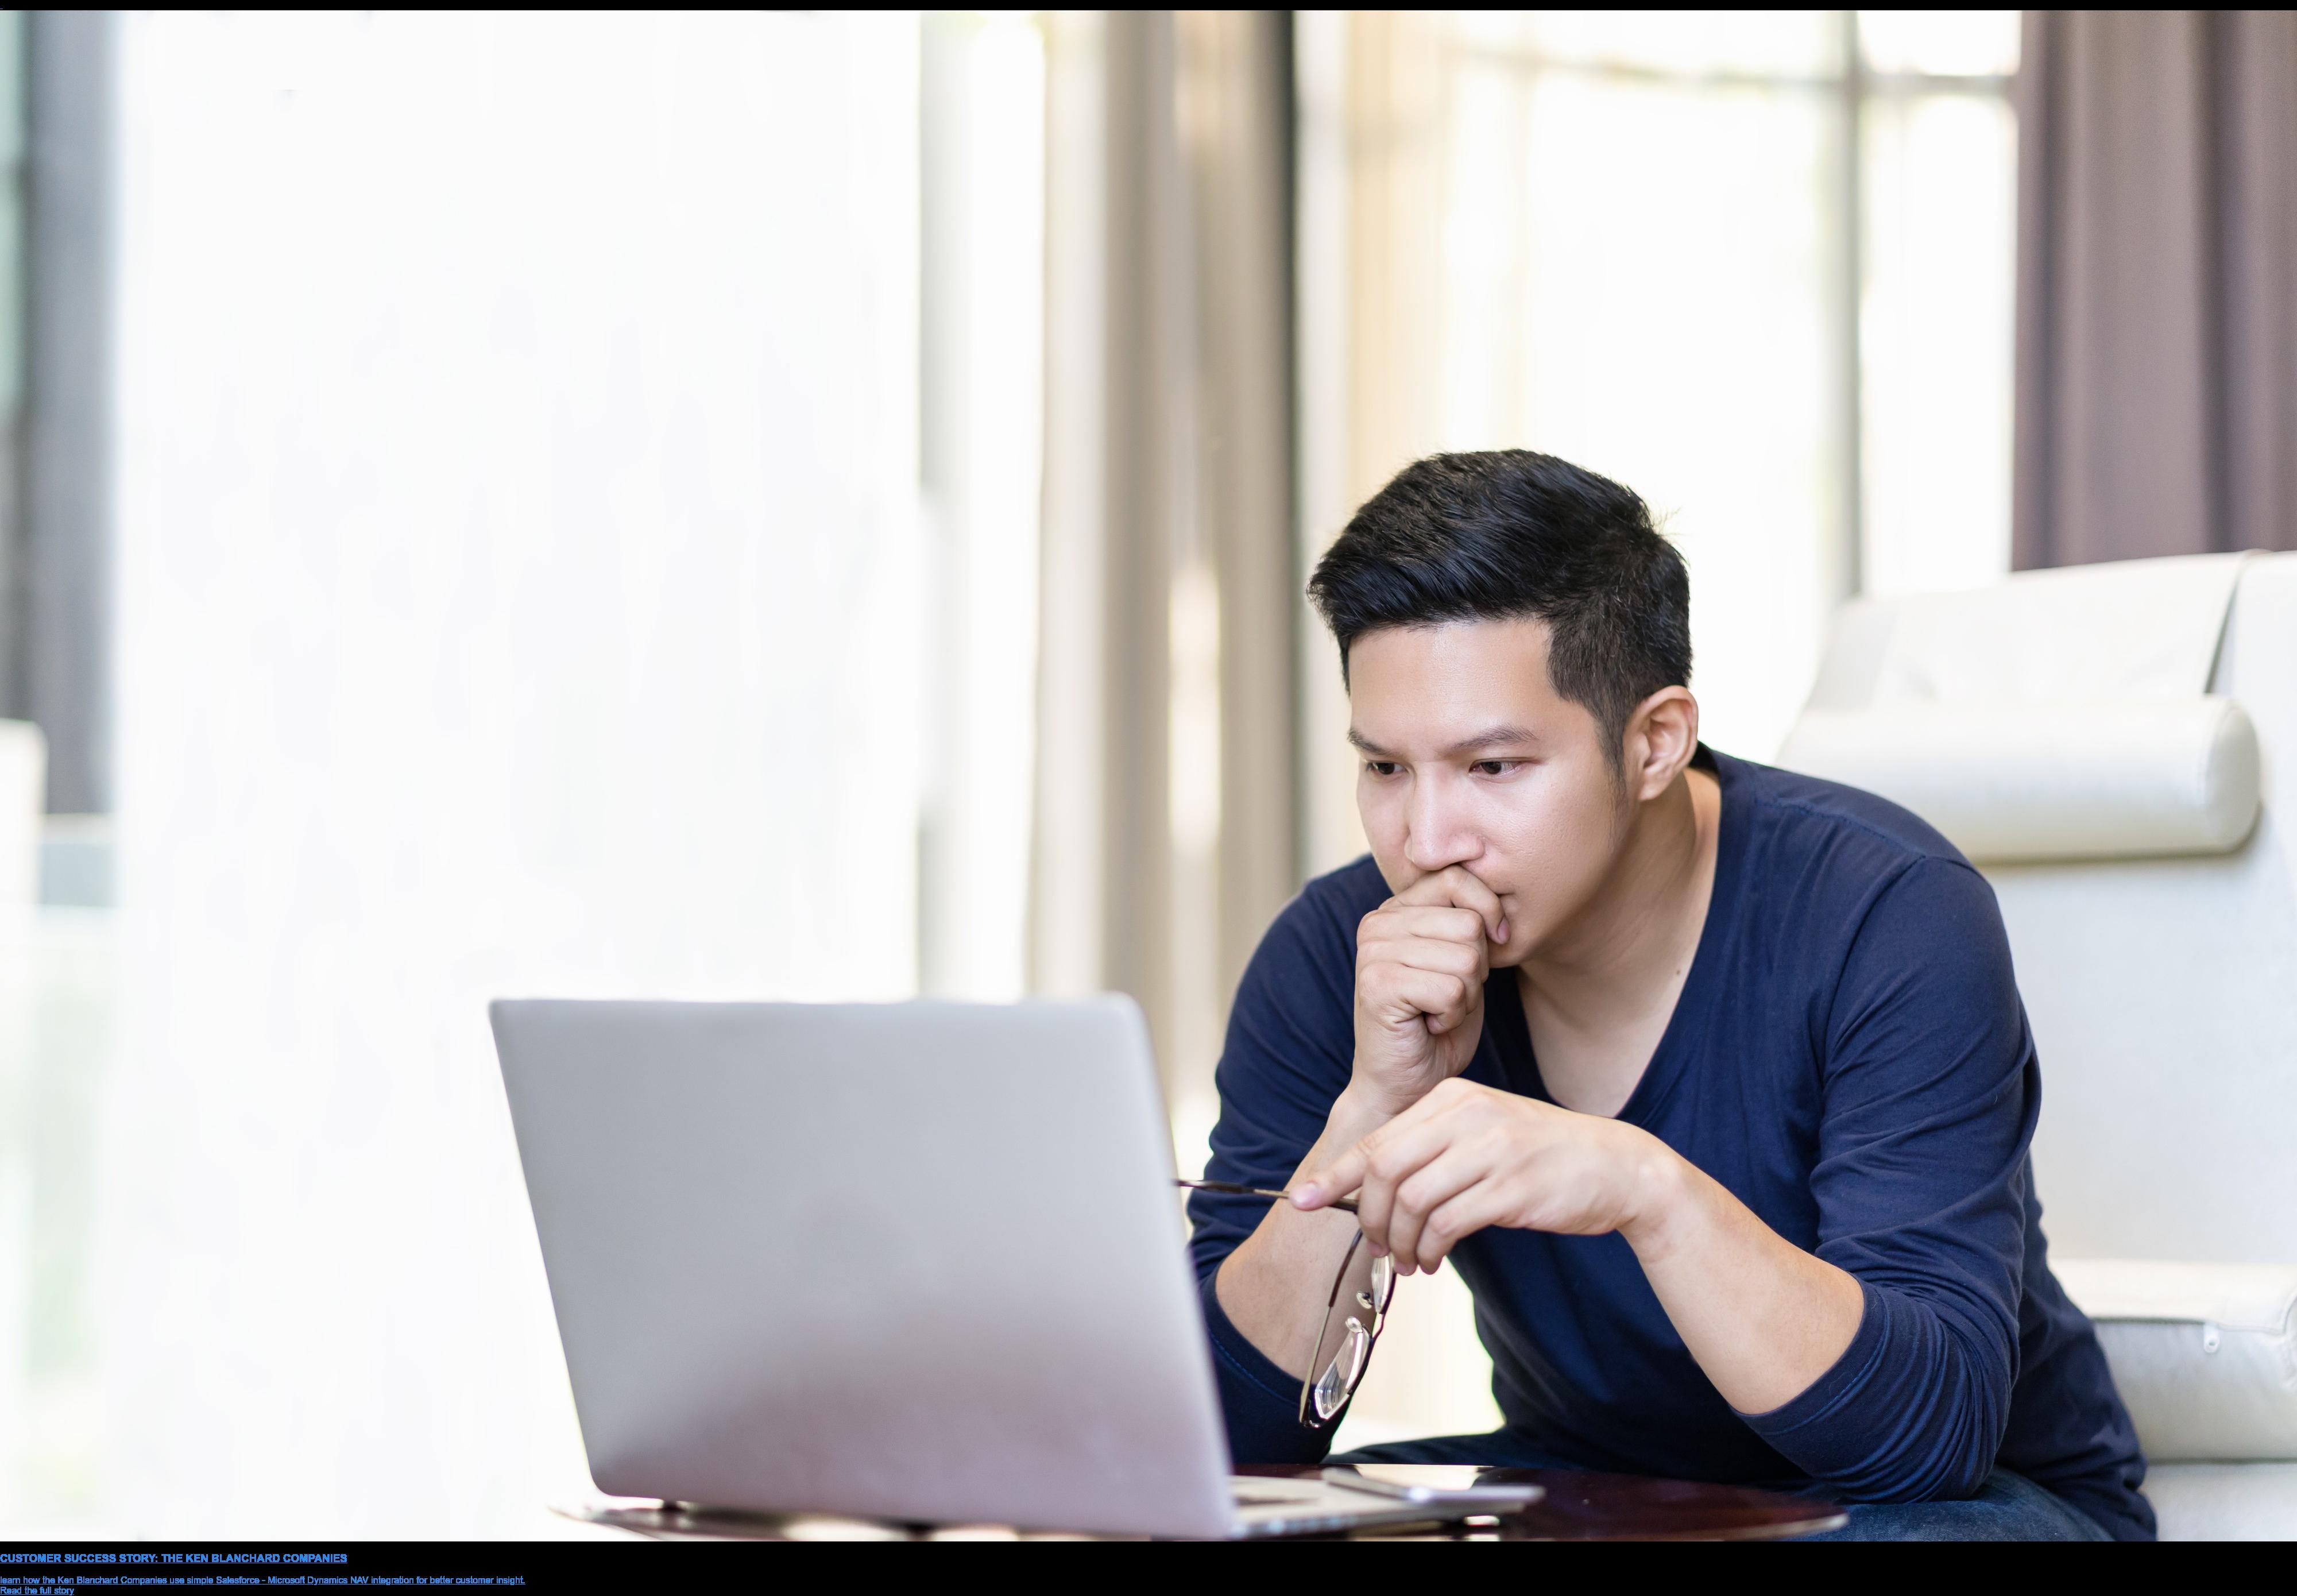 CUSTOMER SUCCESS STORY: THE KEN BLANCHARD COMPANIES  learn how the Ken Blanchard Companies use simple Salesforce - Microsoft  Dynamics NAV integration for better customer insight. Read the full story